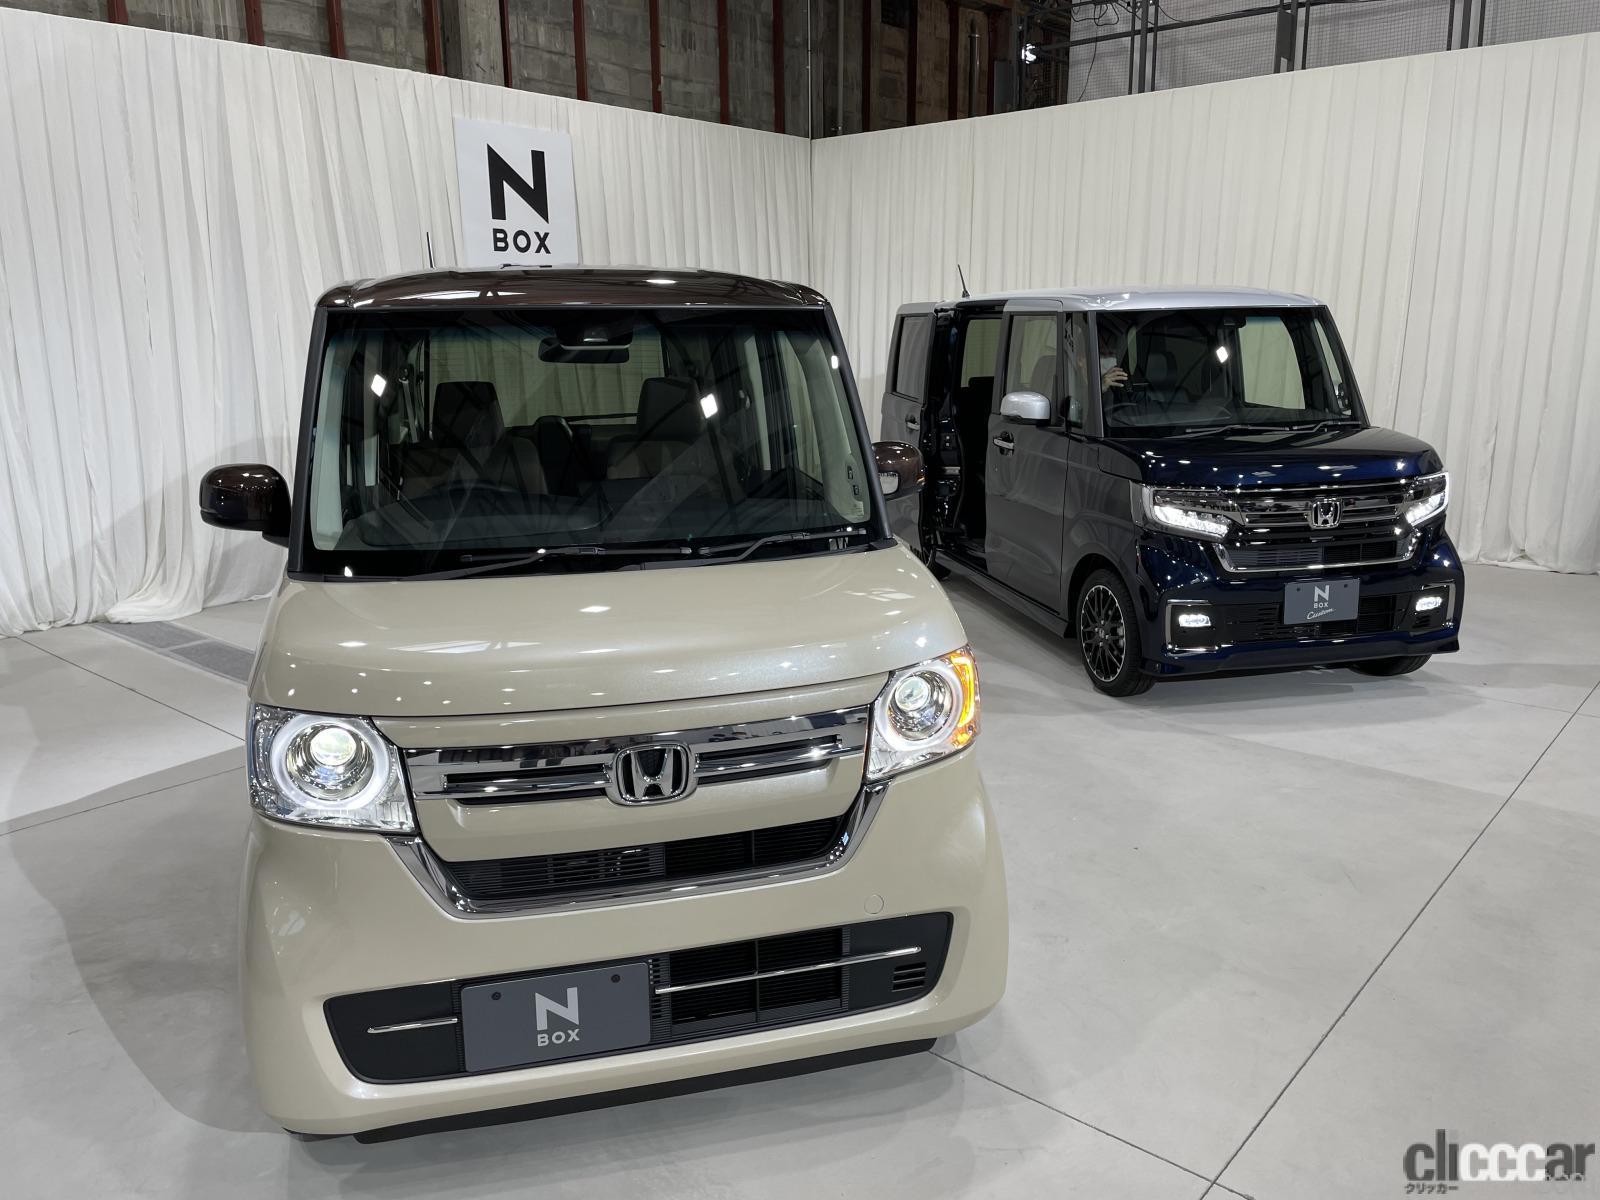 Honda N-BOX 画像 2021年になっても軽自動車の前側ナンバープレートが真ん中よりちょっとずれてる理由は ...